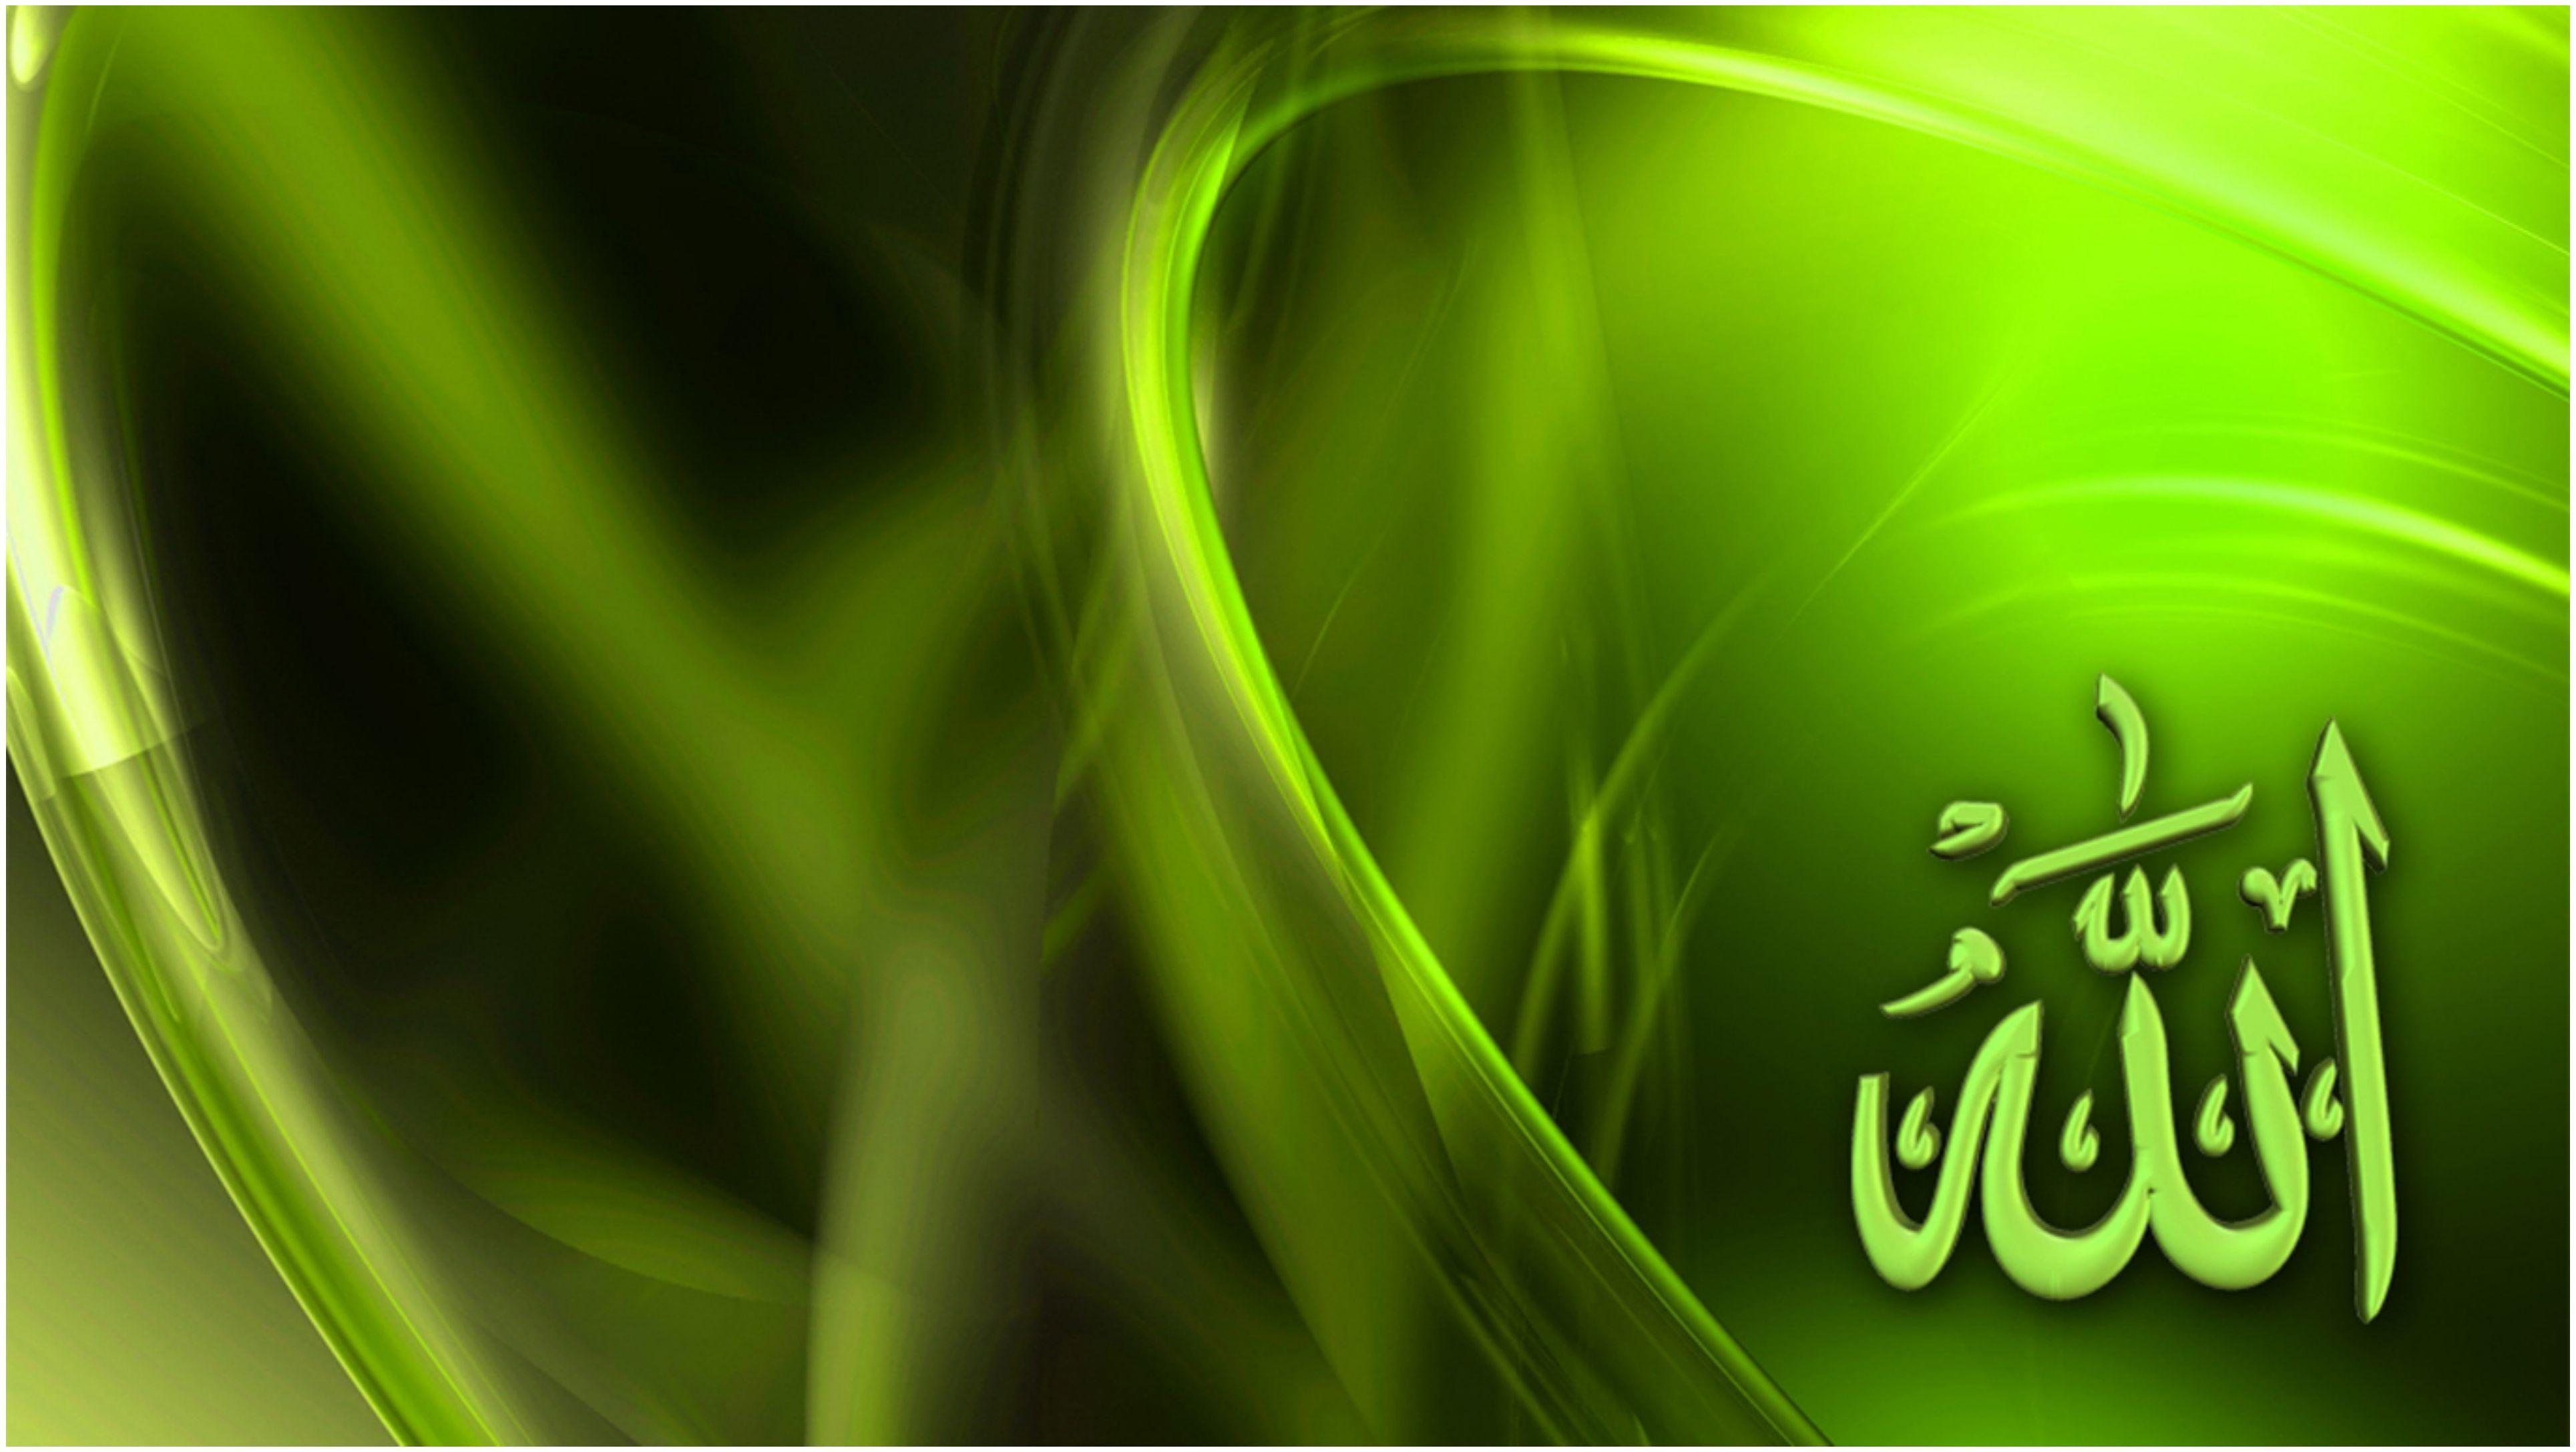 Allah Islamic Green Wallpapers Hd 9 Wallpapers Hd Green Wallpaper Islamic Wallpaper Hd Islamic Wallpaper